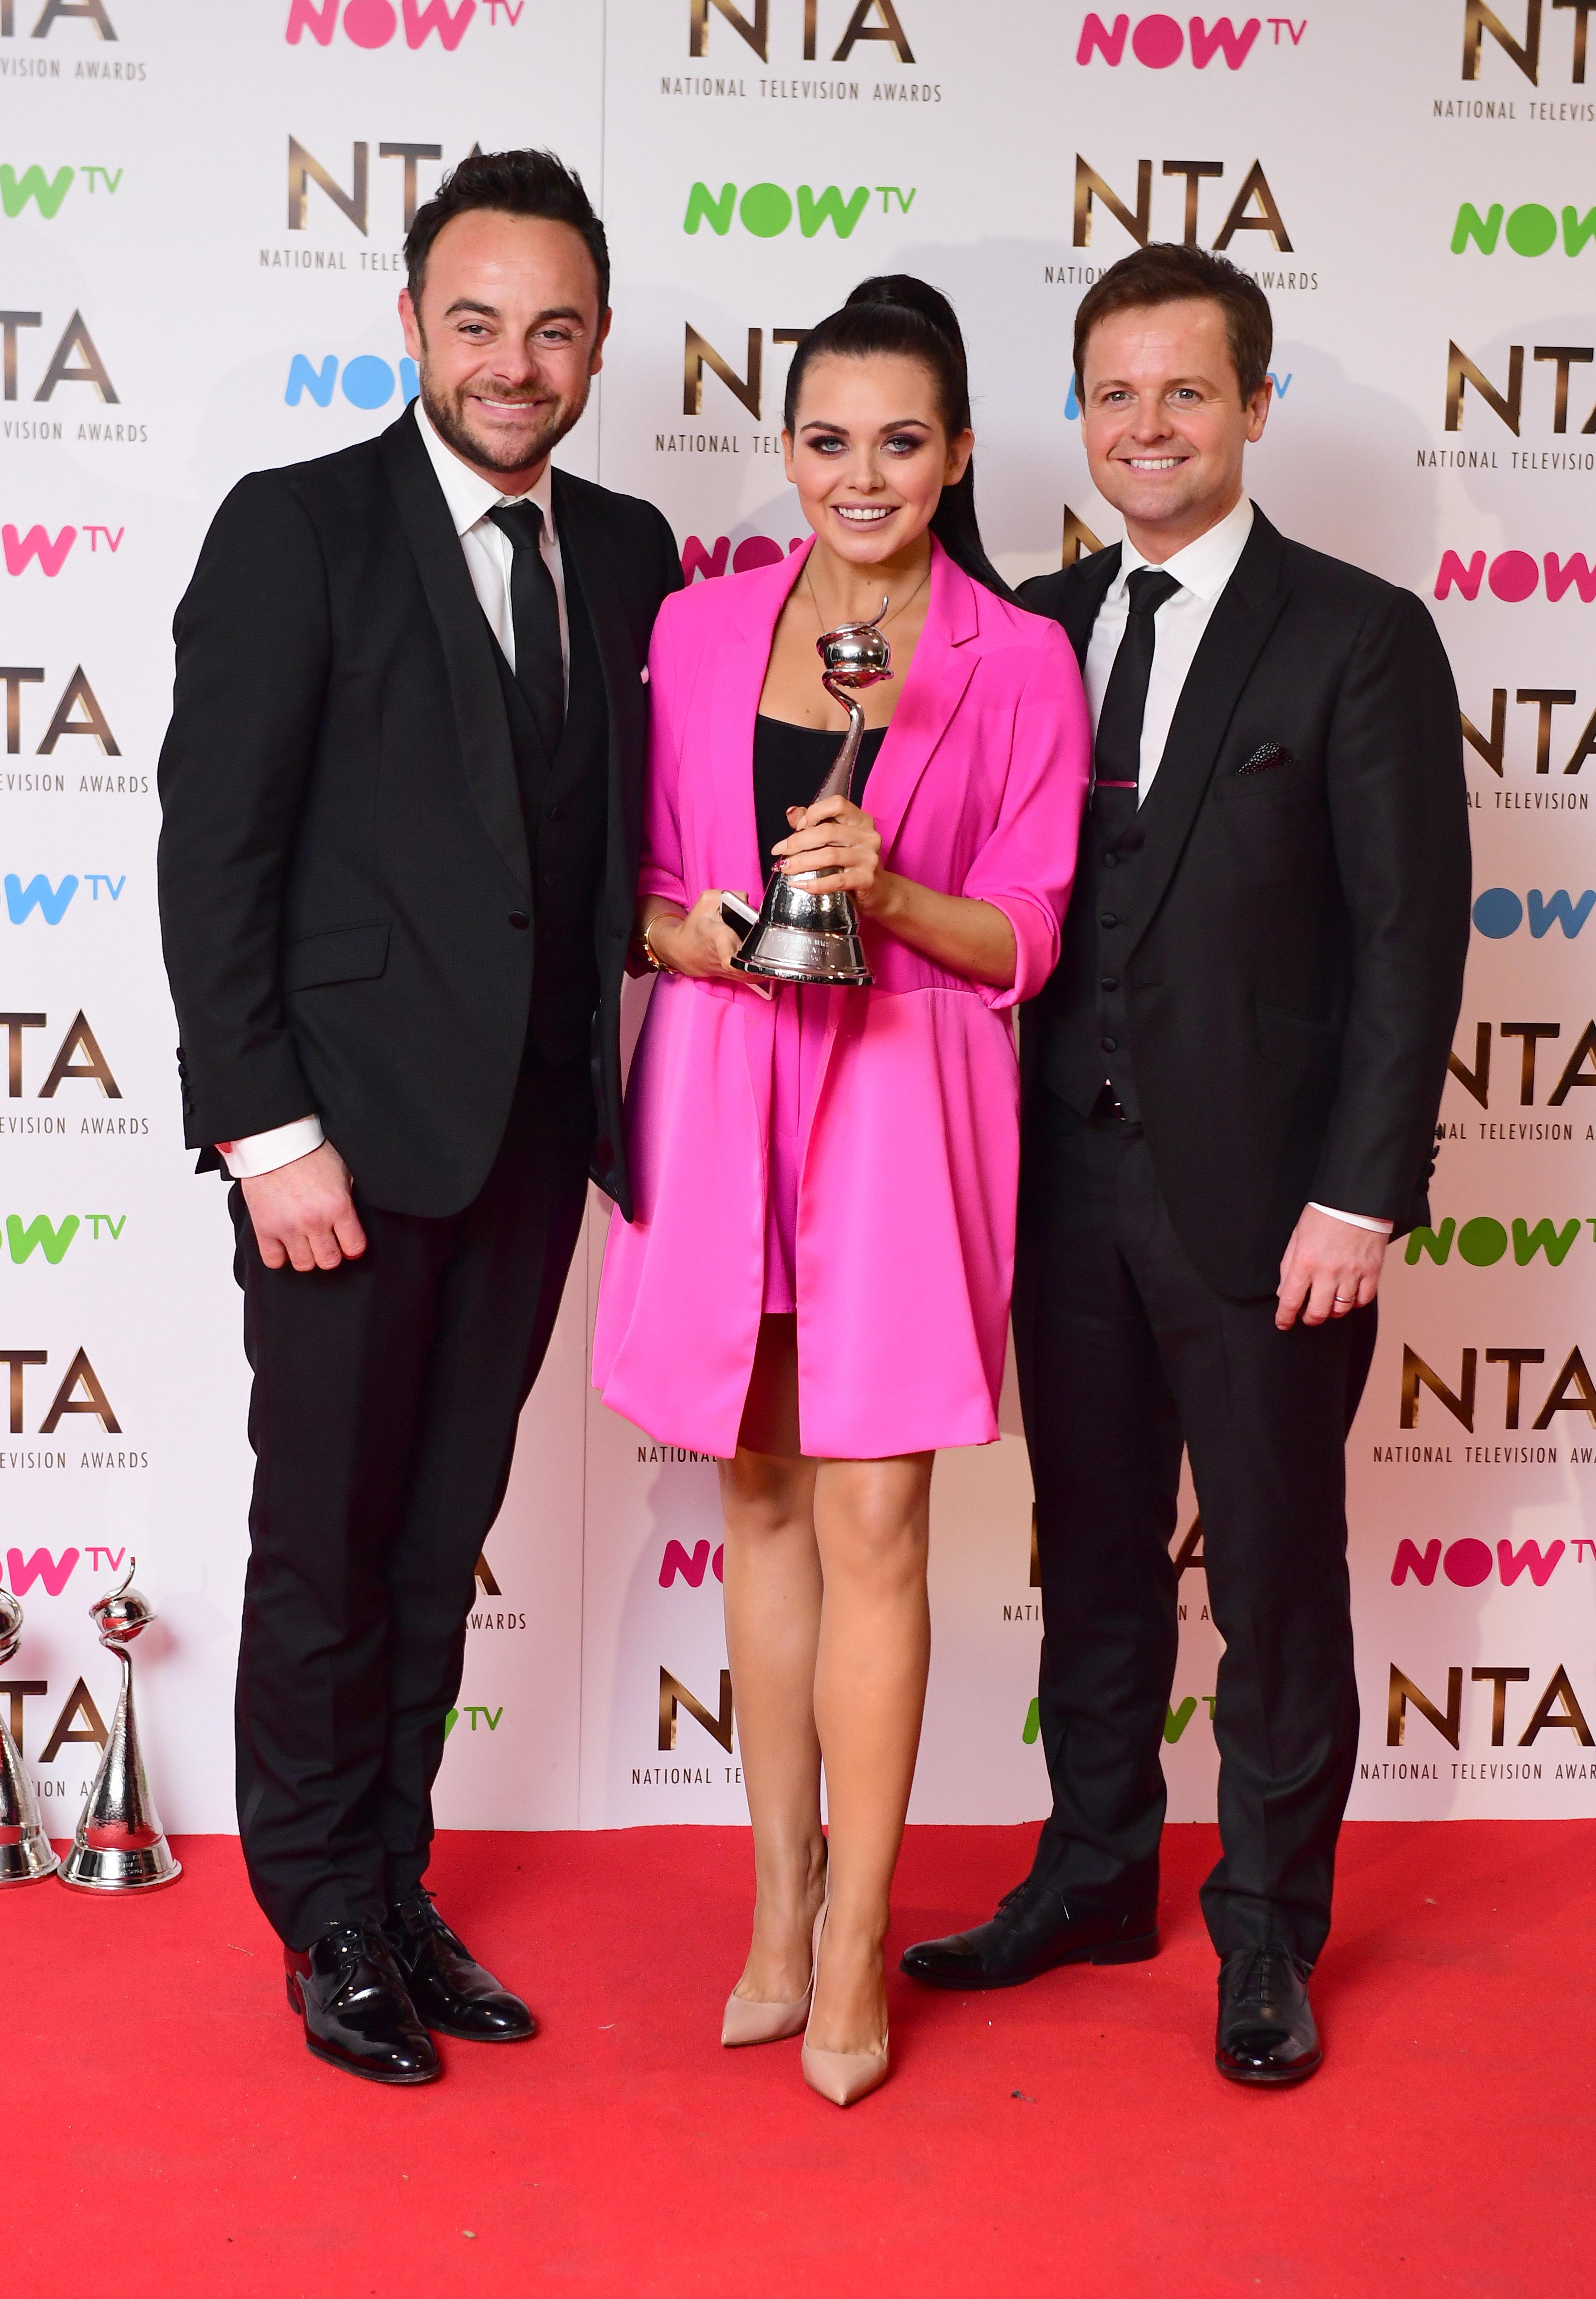 Scarlett Moffatt Laughs Off 'Ludicrous' Ant McPartlin Romance